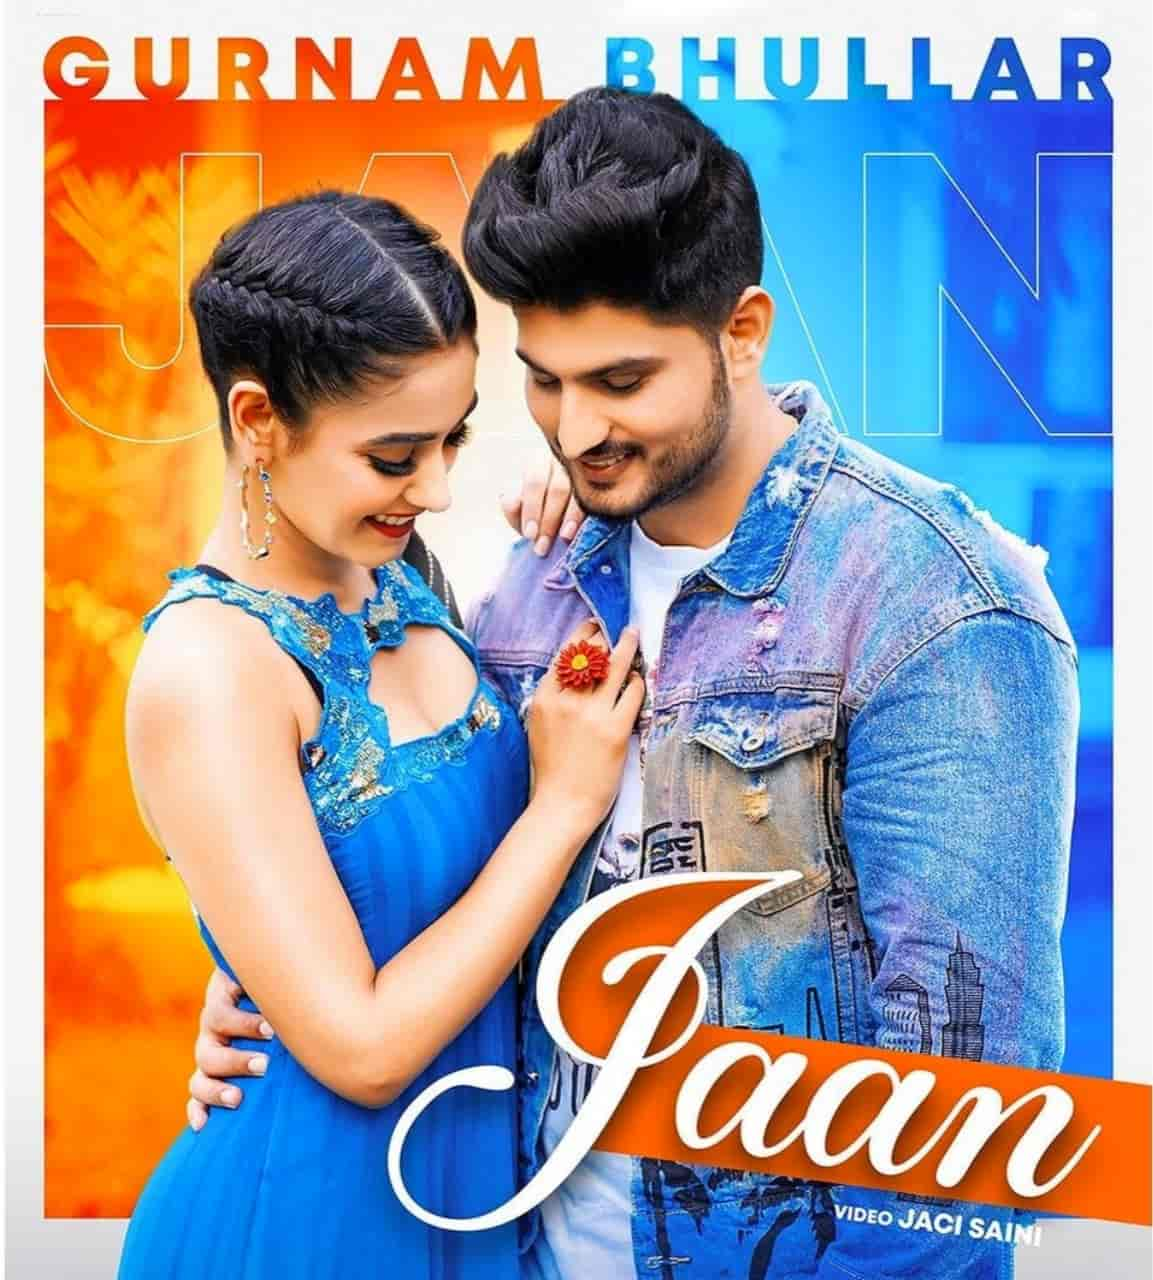 Jaan Punjabi Song Image Features Gurnam Bhullar And Charvi Dutta